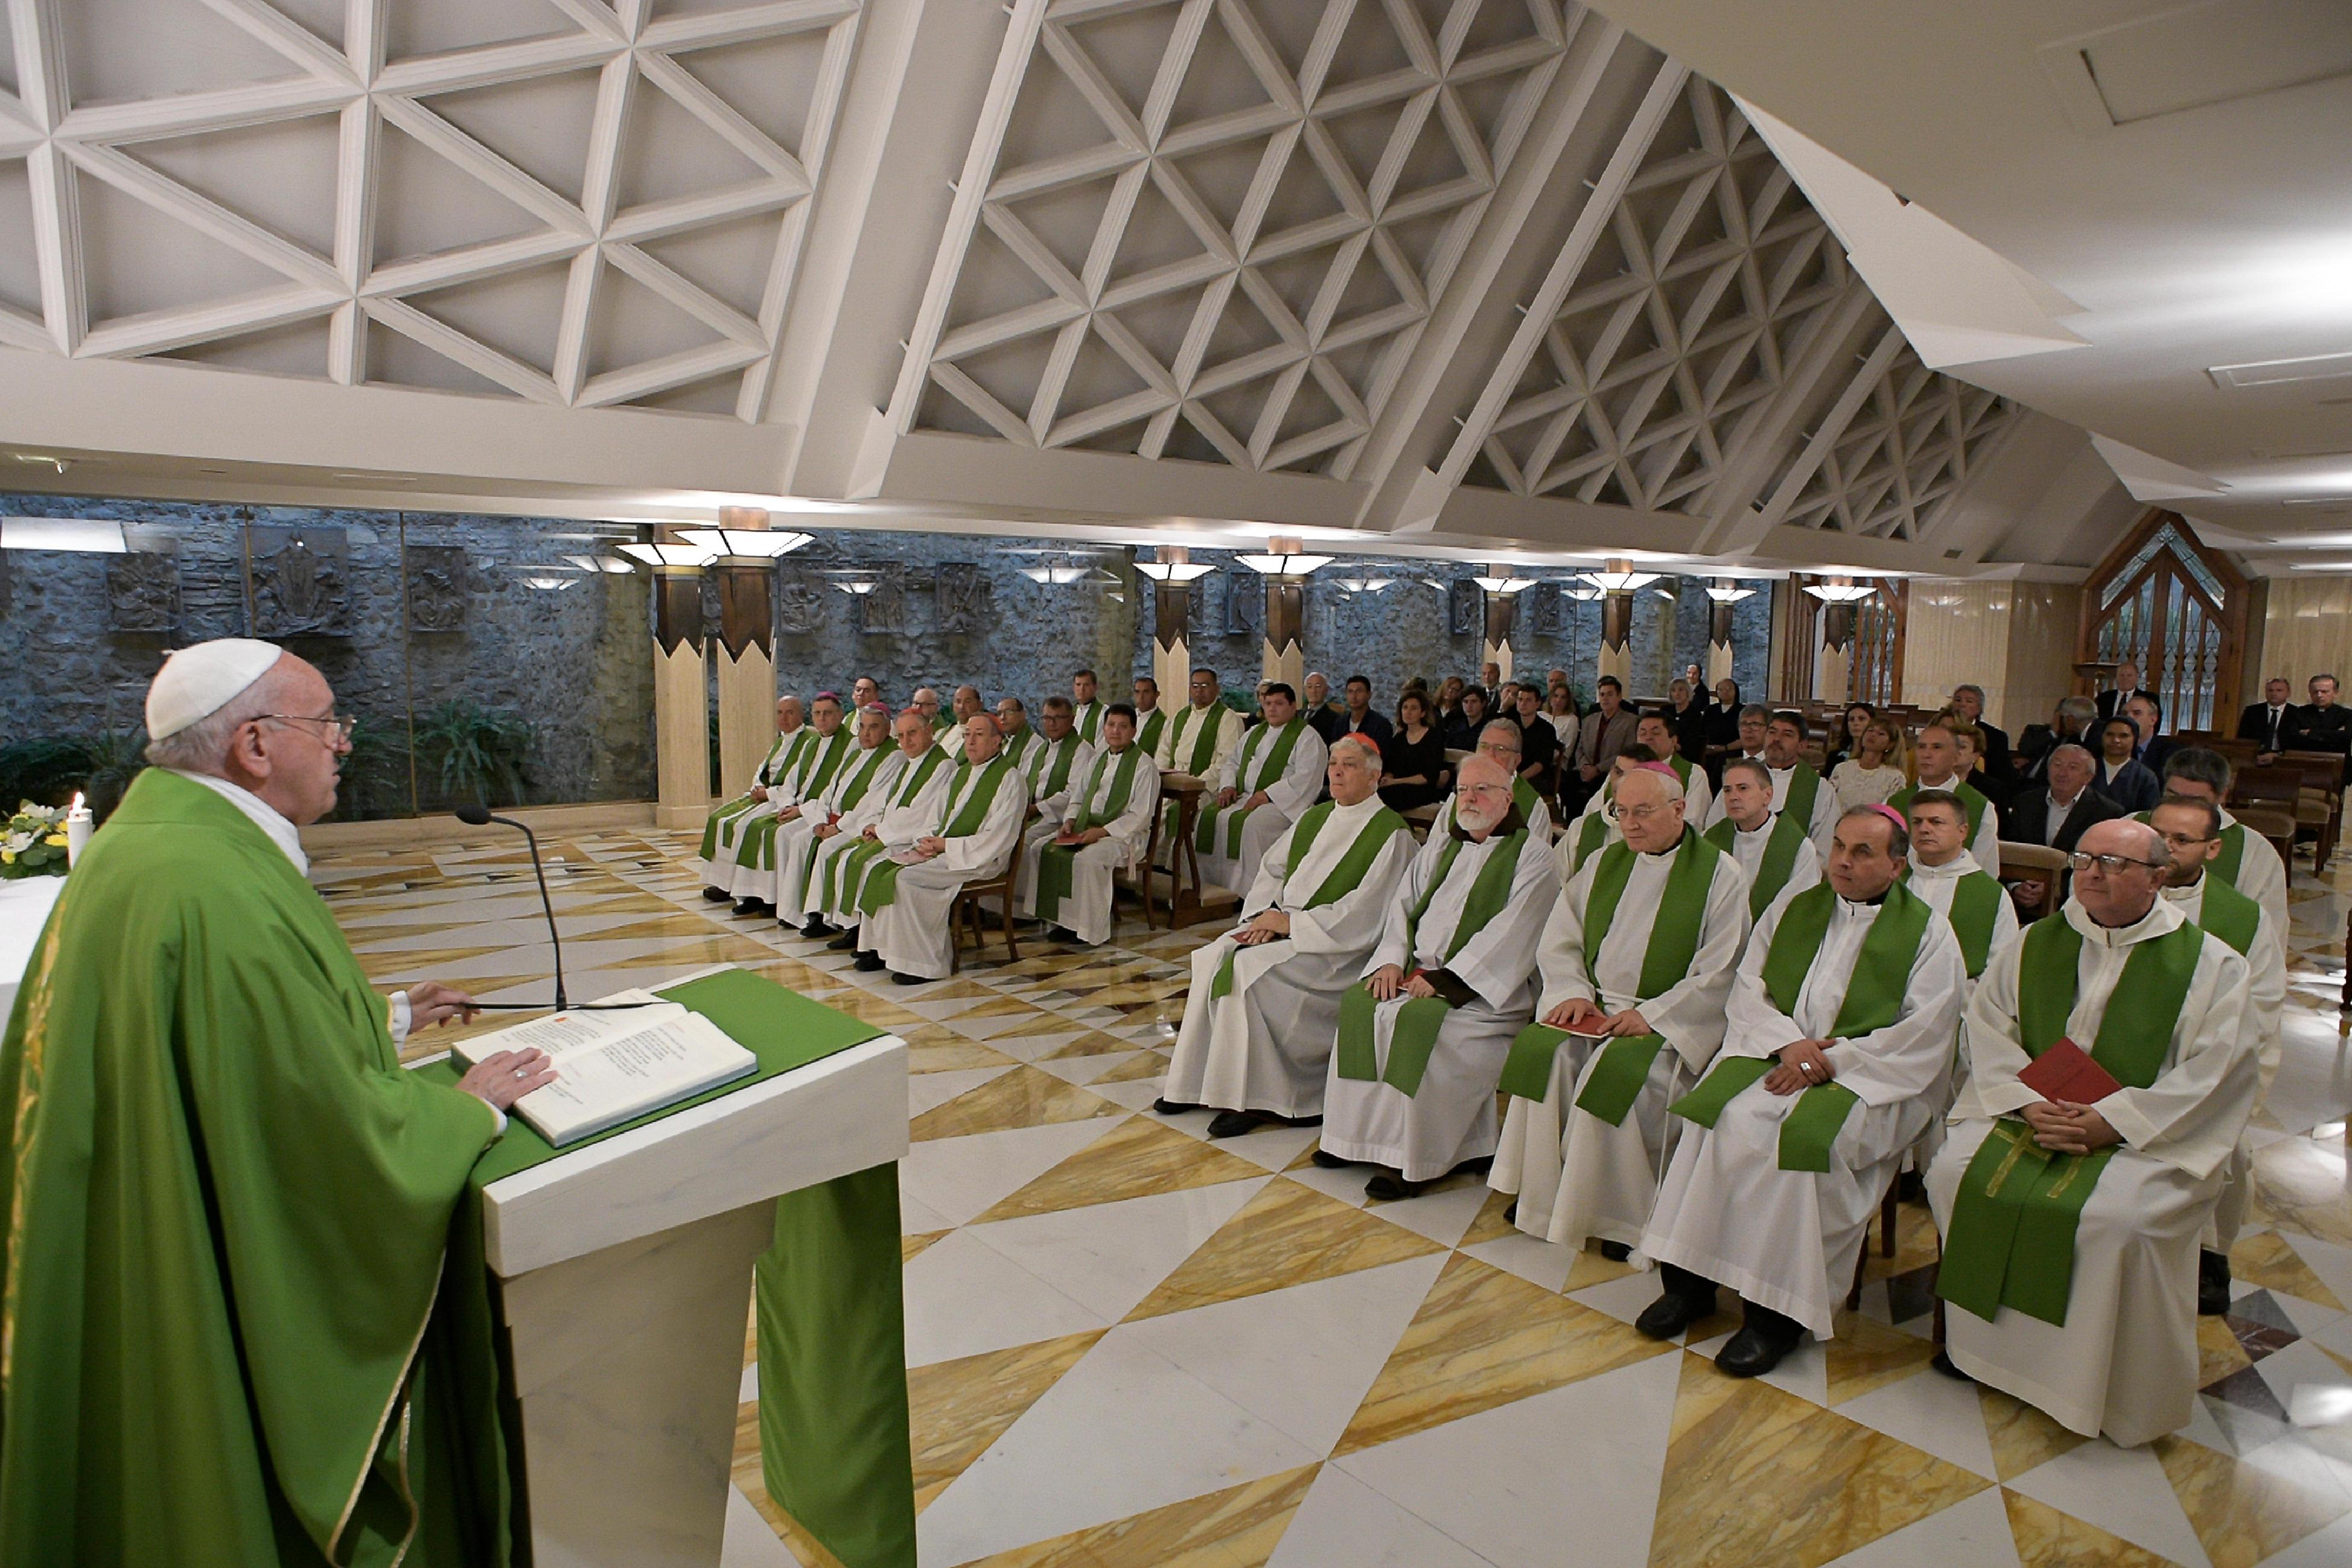 Misa del Papa en Santa Marta, 19 sept. 2019 © Vatican Media